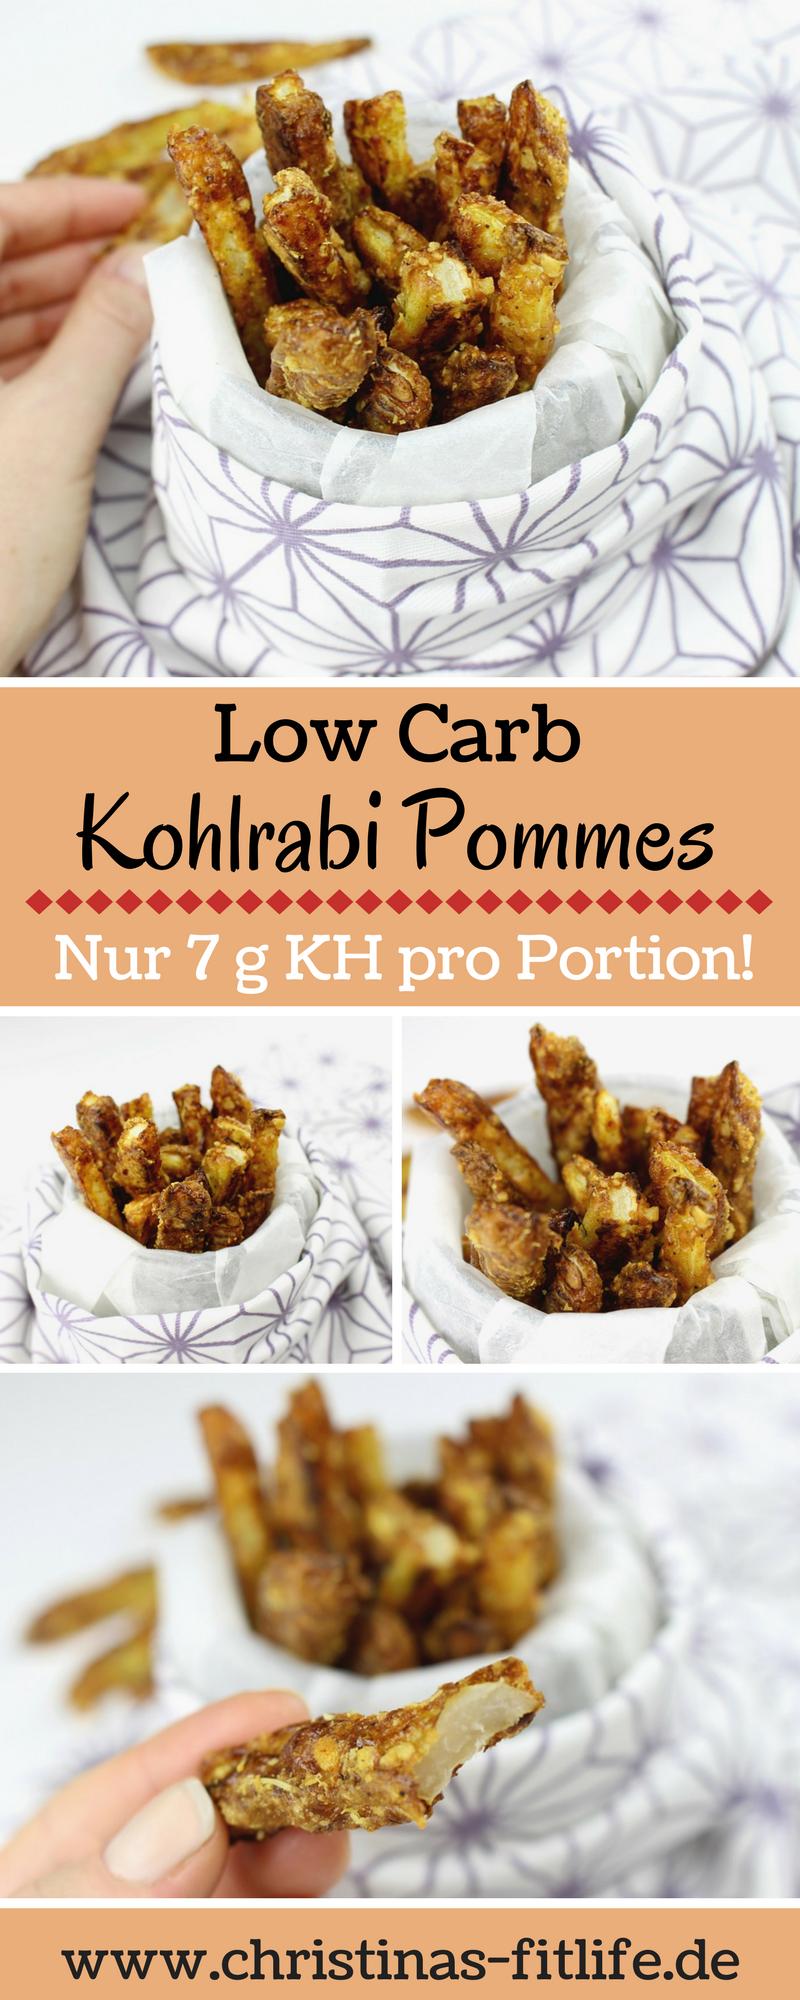 Photo of Low carb kohlrabi fries